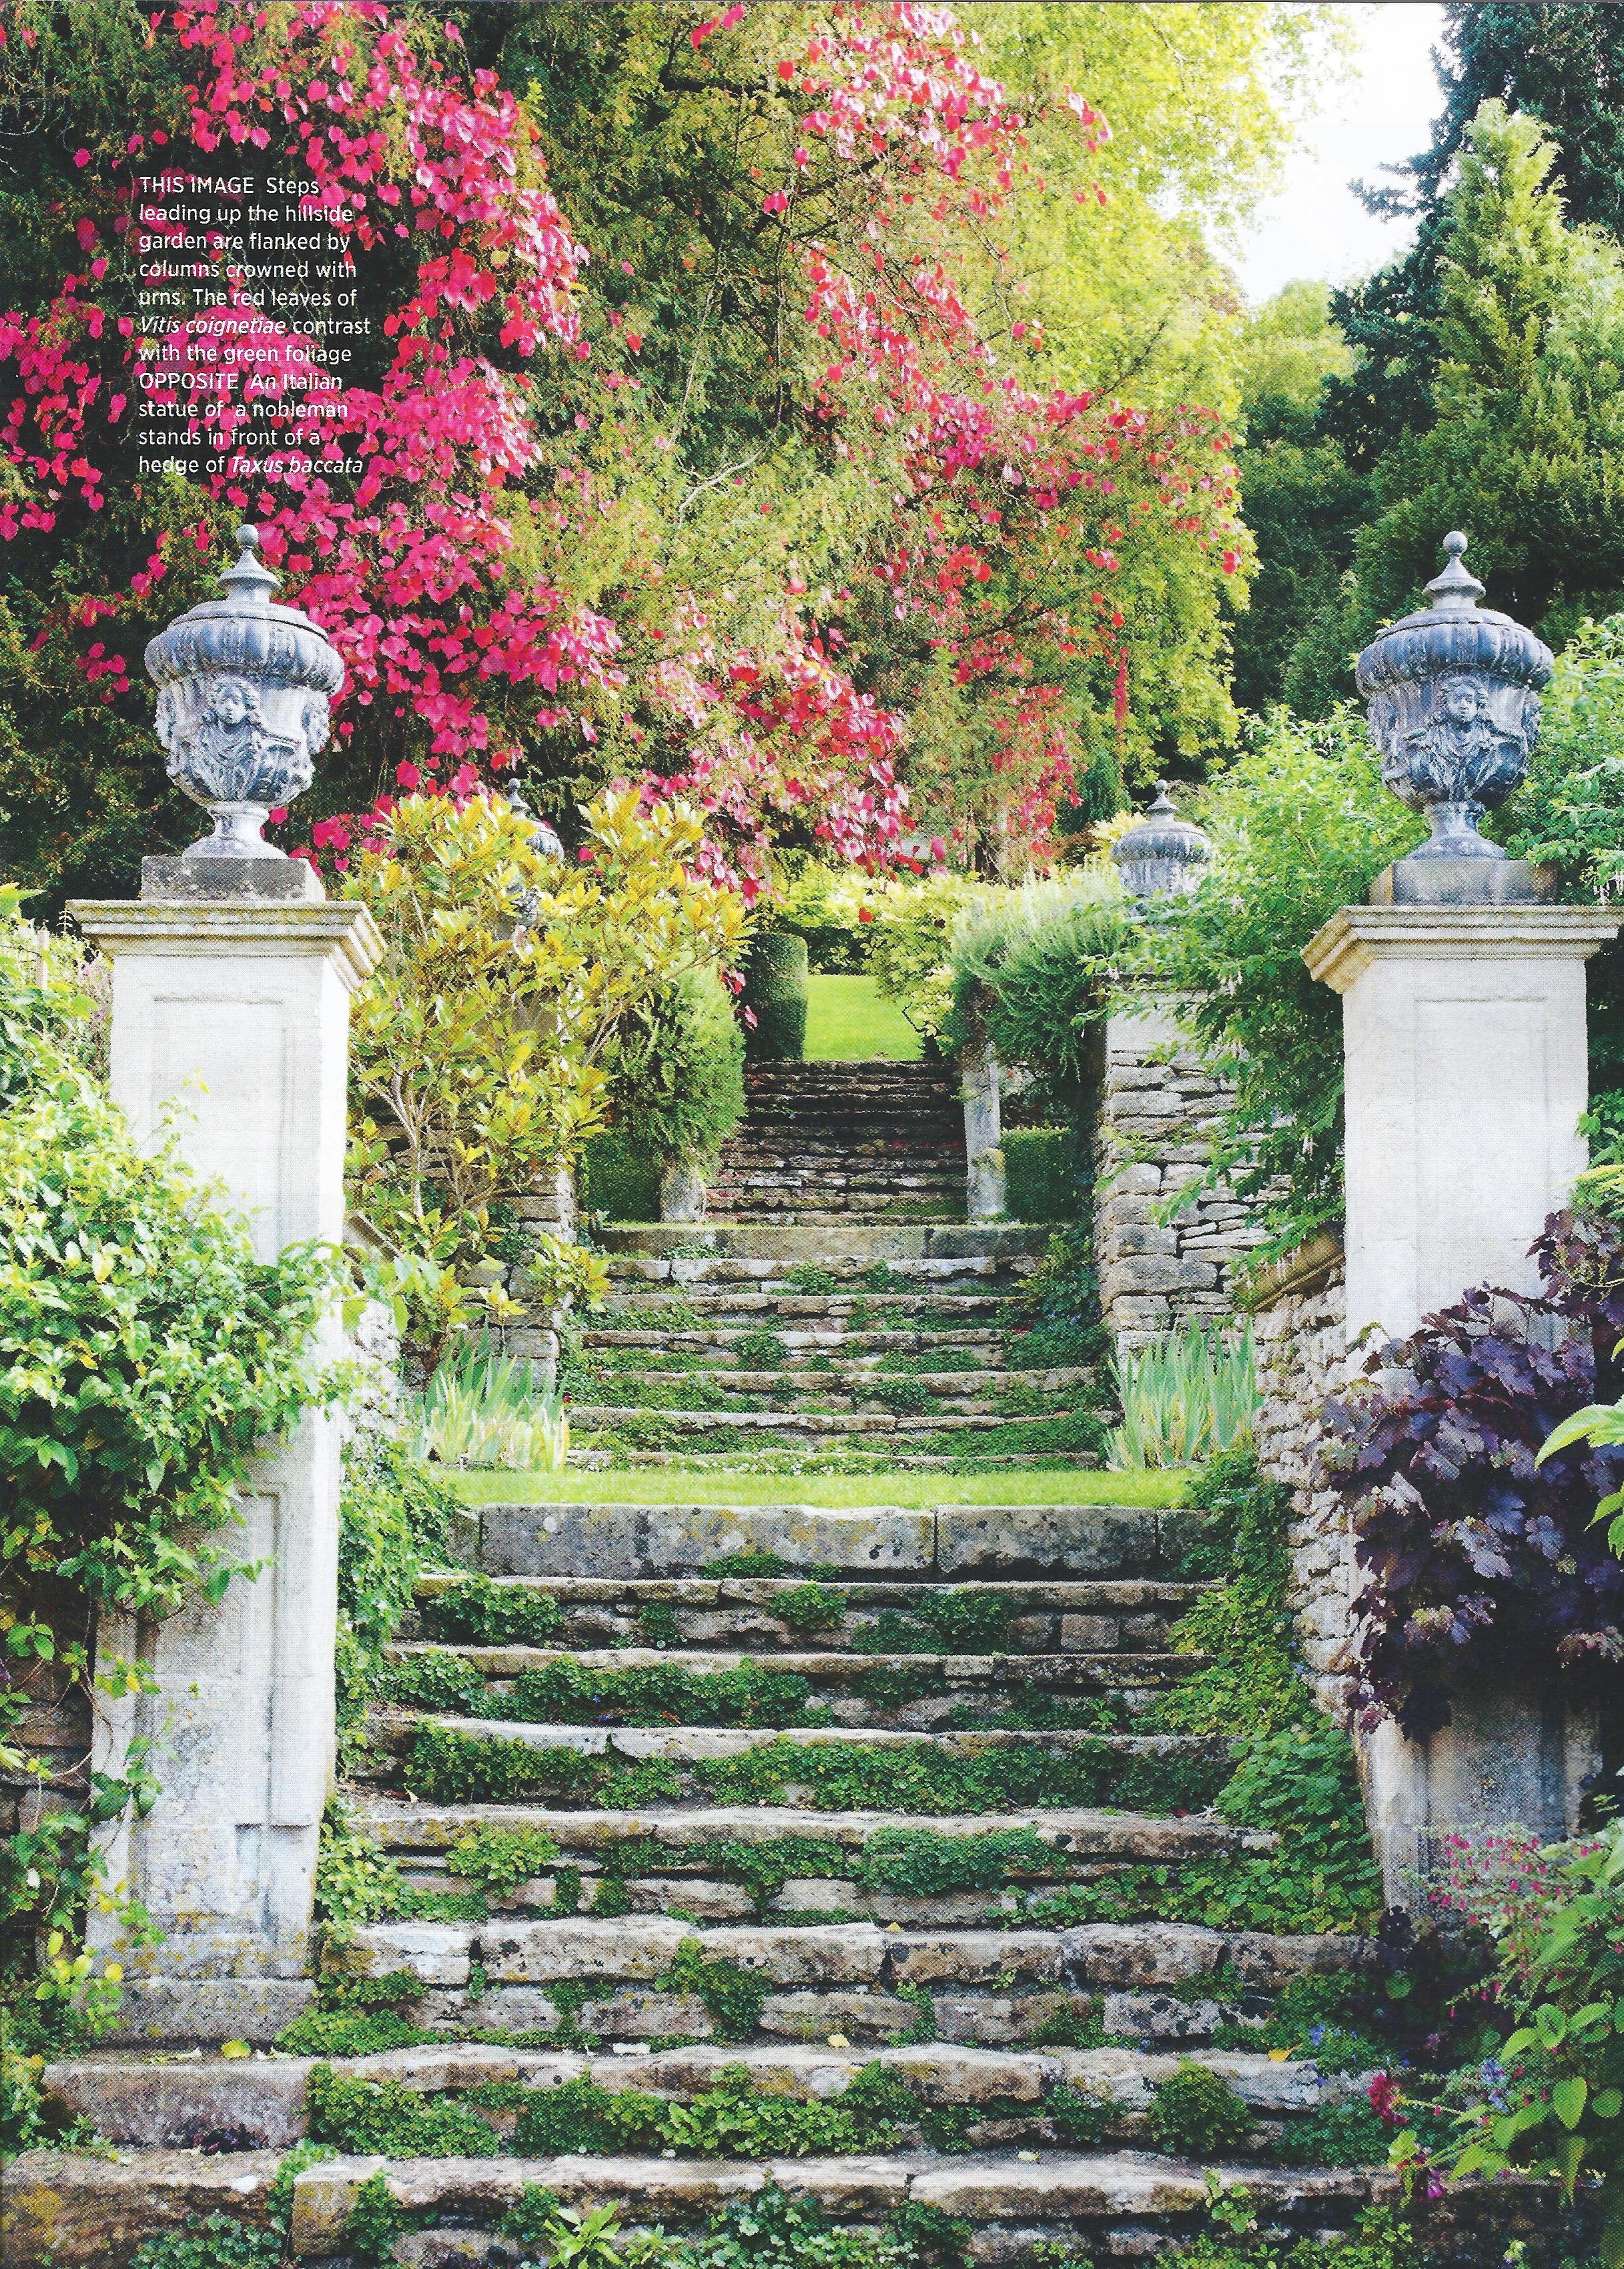 PL-Iford Manor-1.jpg